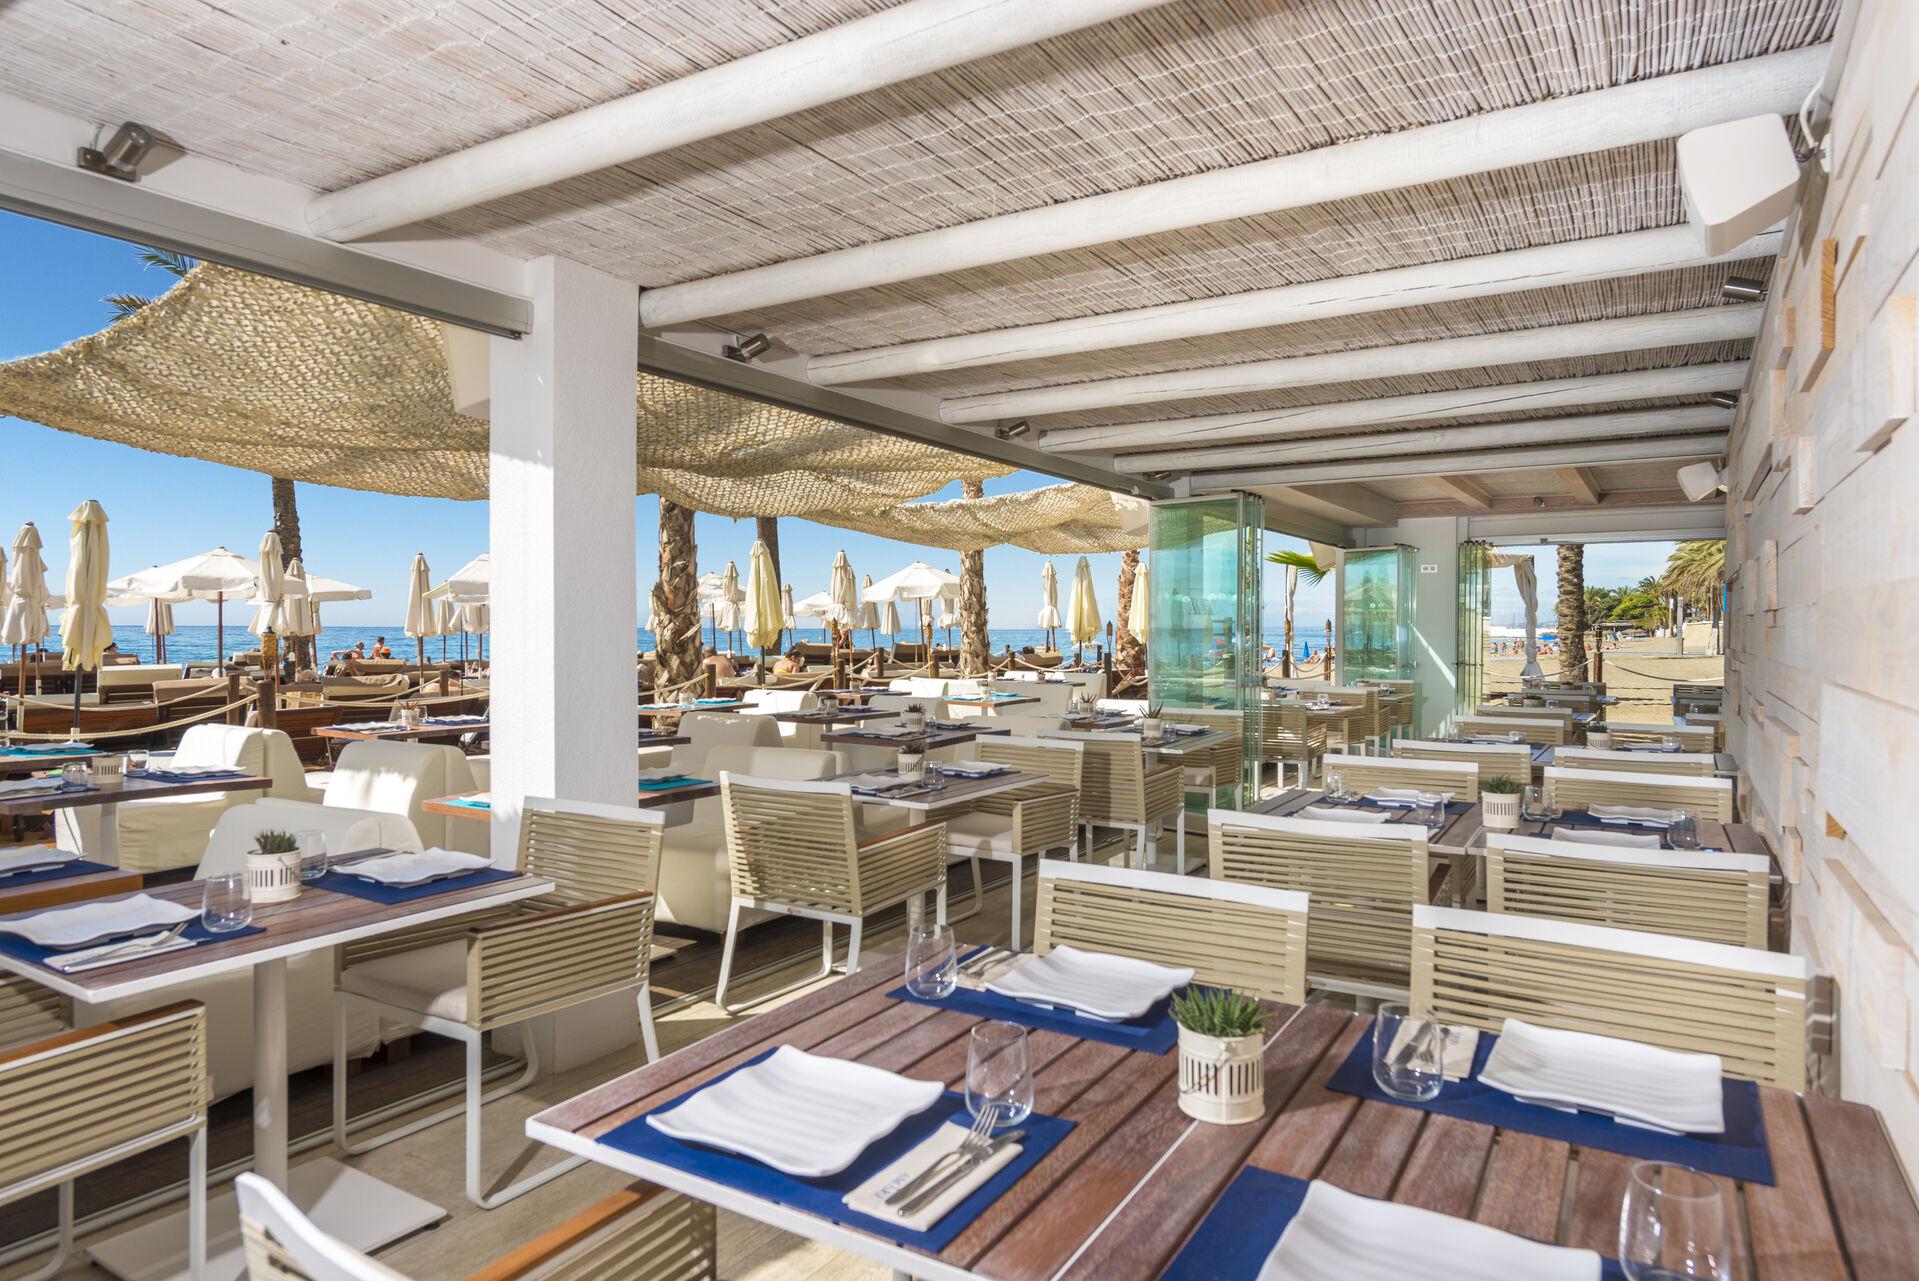 https://cms.satur.sk/data/imgs/tour_image/orig/amare-marbella-beach-restaurante-1-1972161.jpg